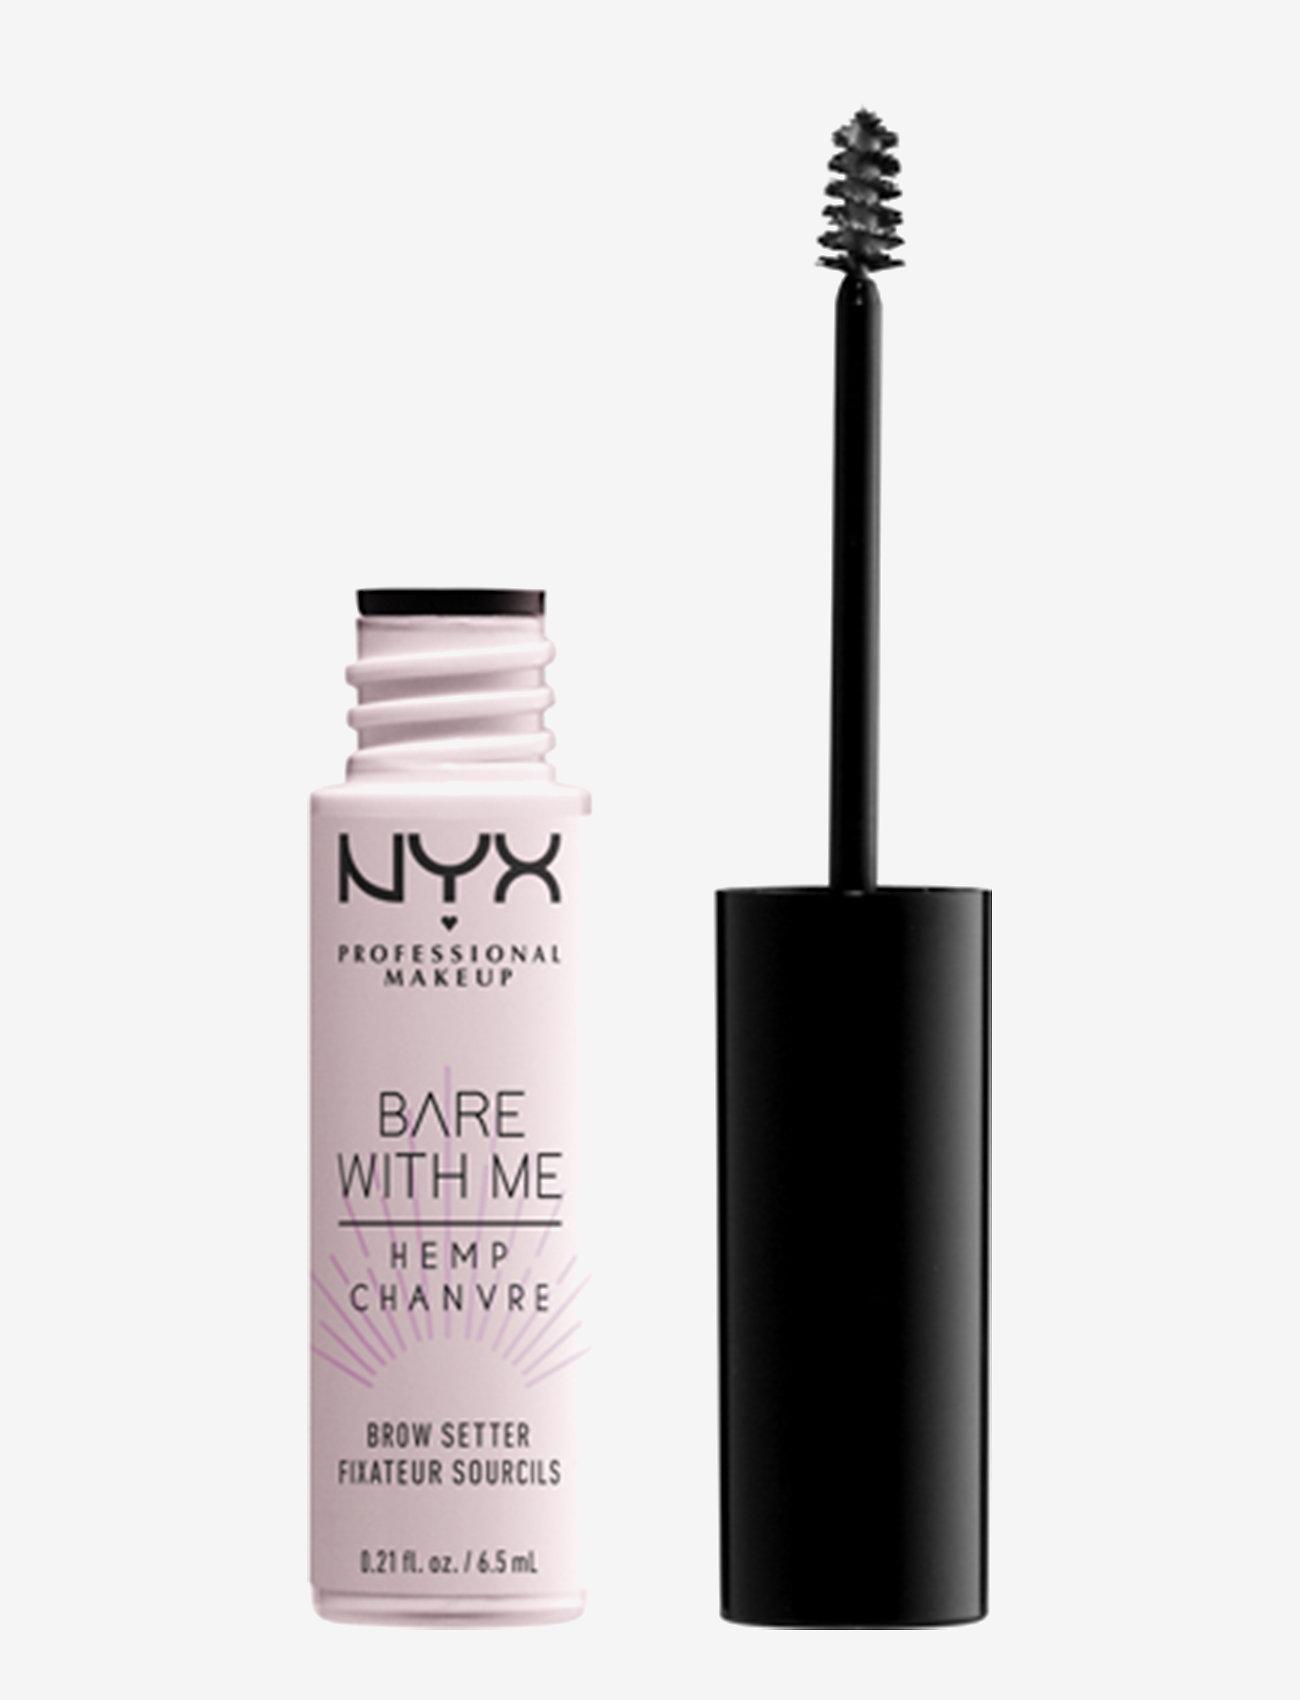 NYX PROFESSIONAL MAKEUP - Bare With Me Hemp Brow Setter - Øjenbrynsgel - no colour - 0